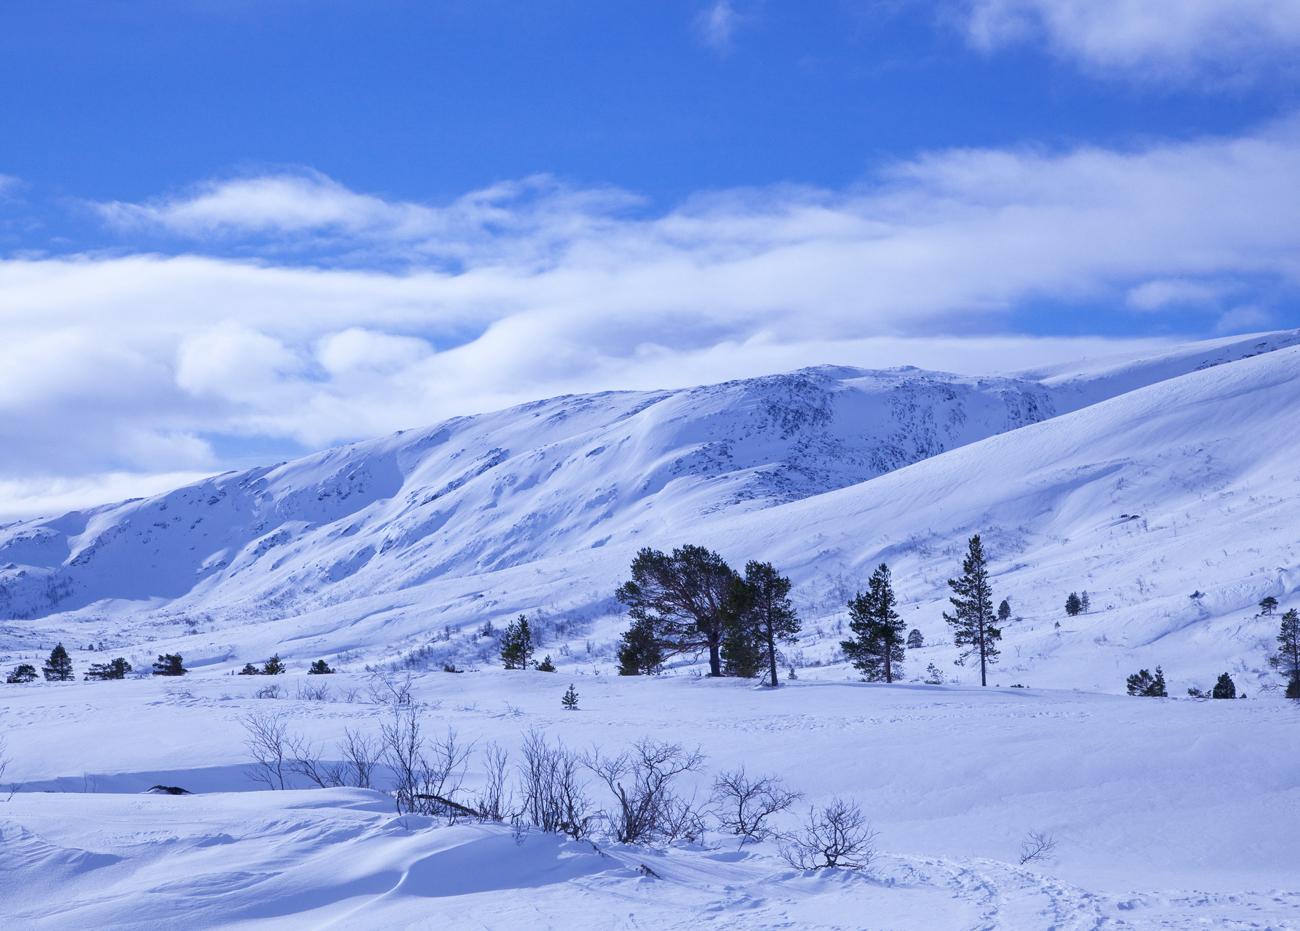 170321d-fjell.jpg